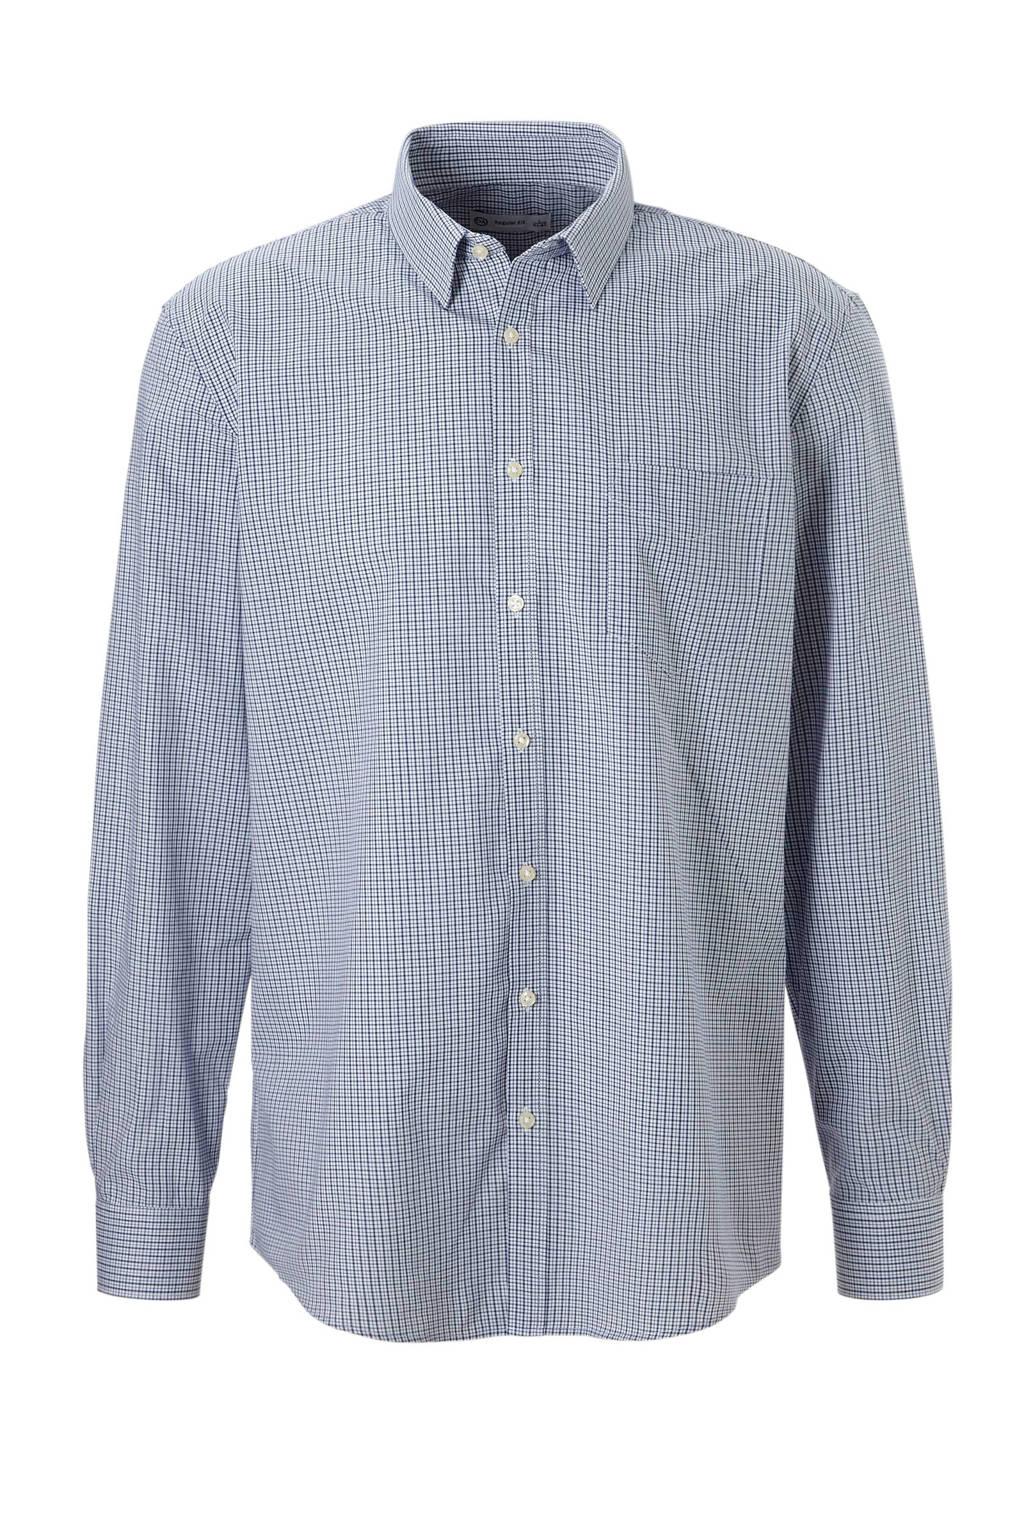 C&A overhemd, Blauw